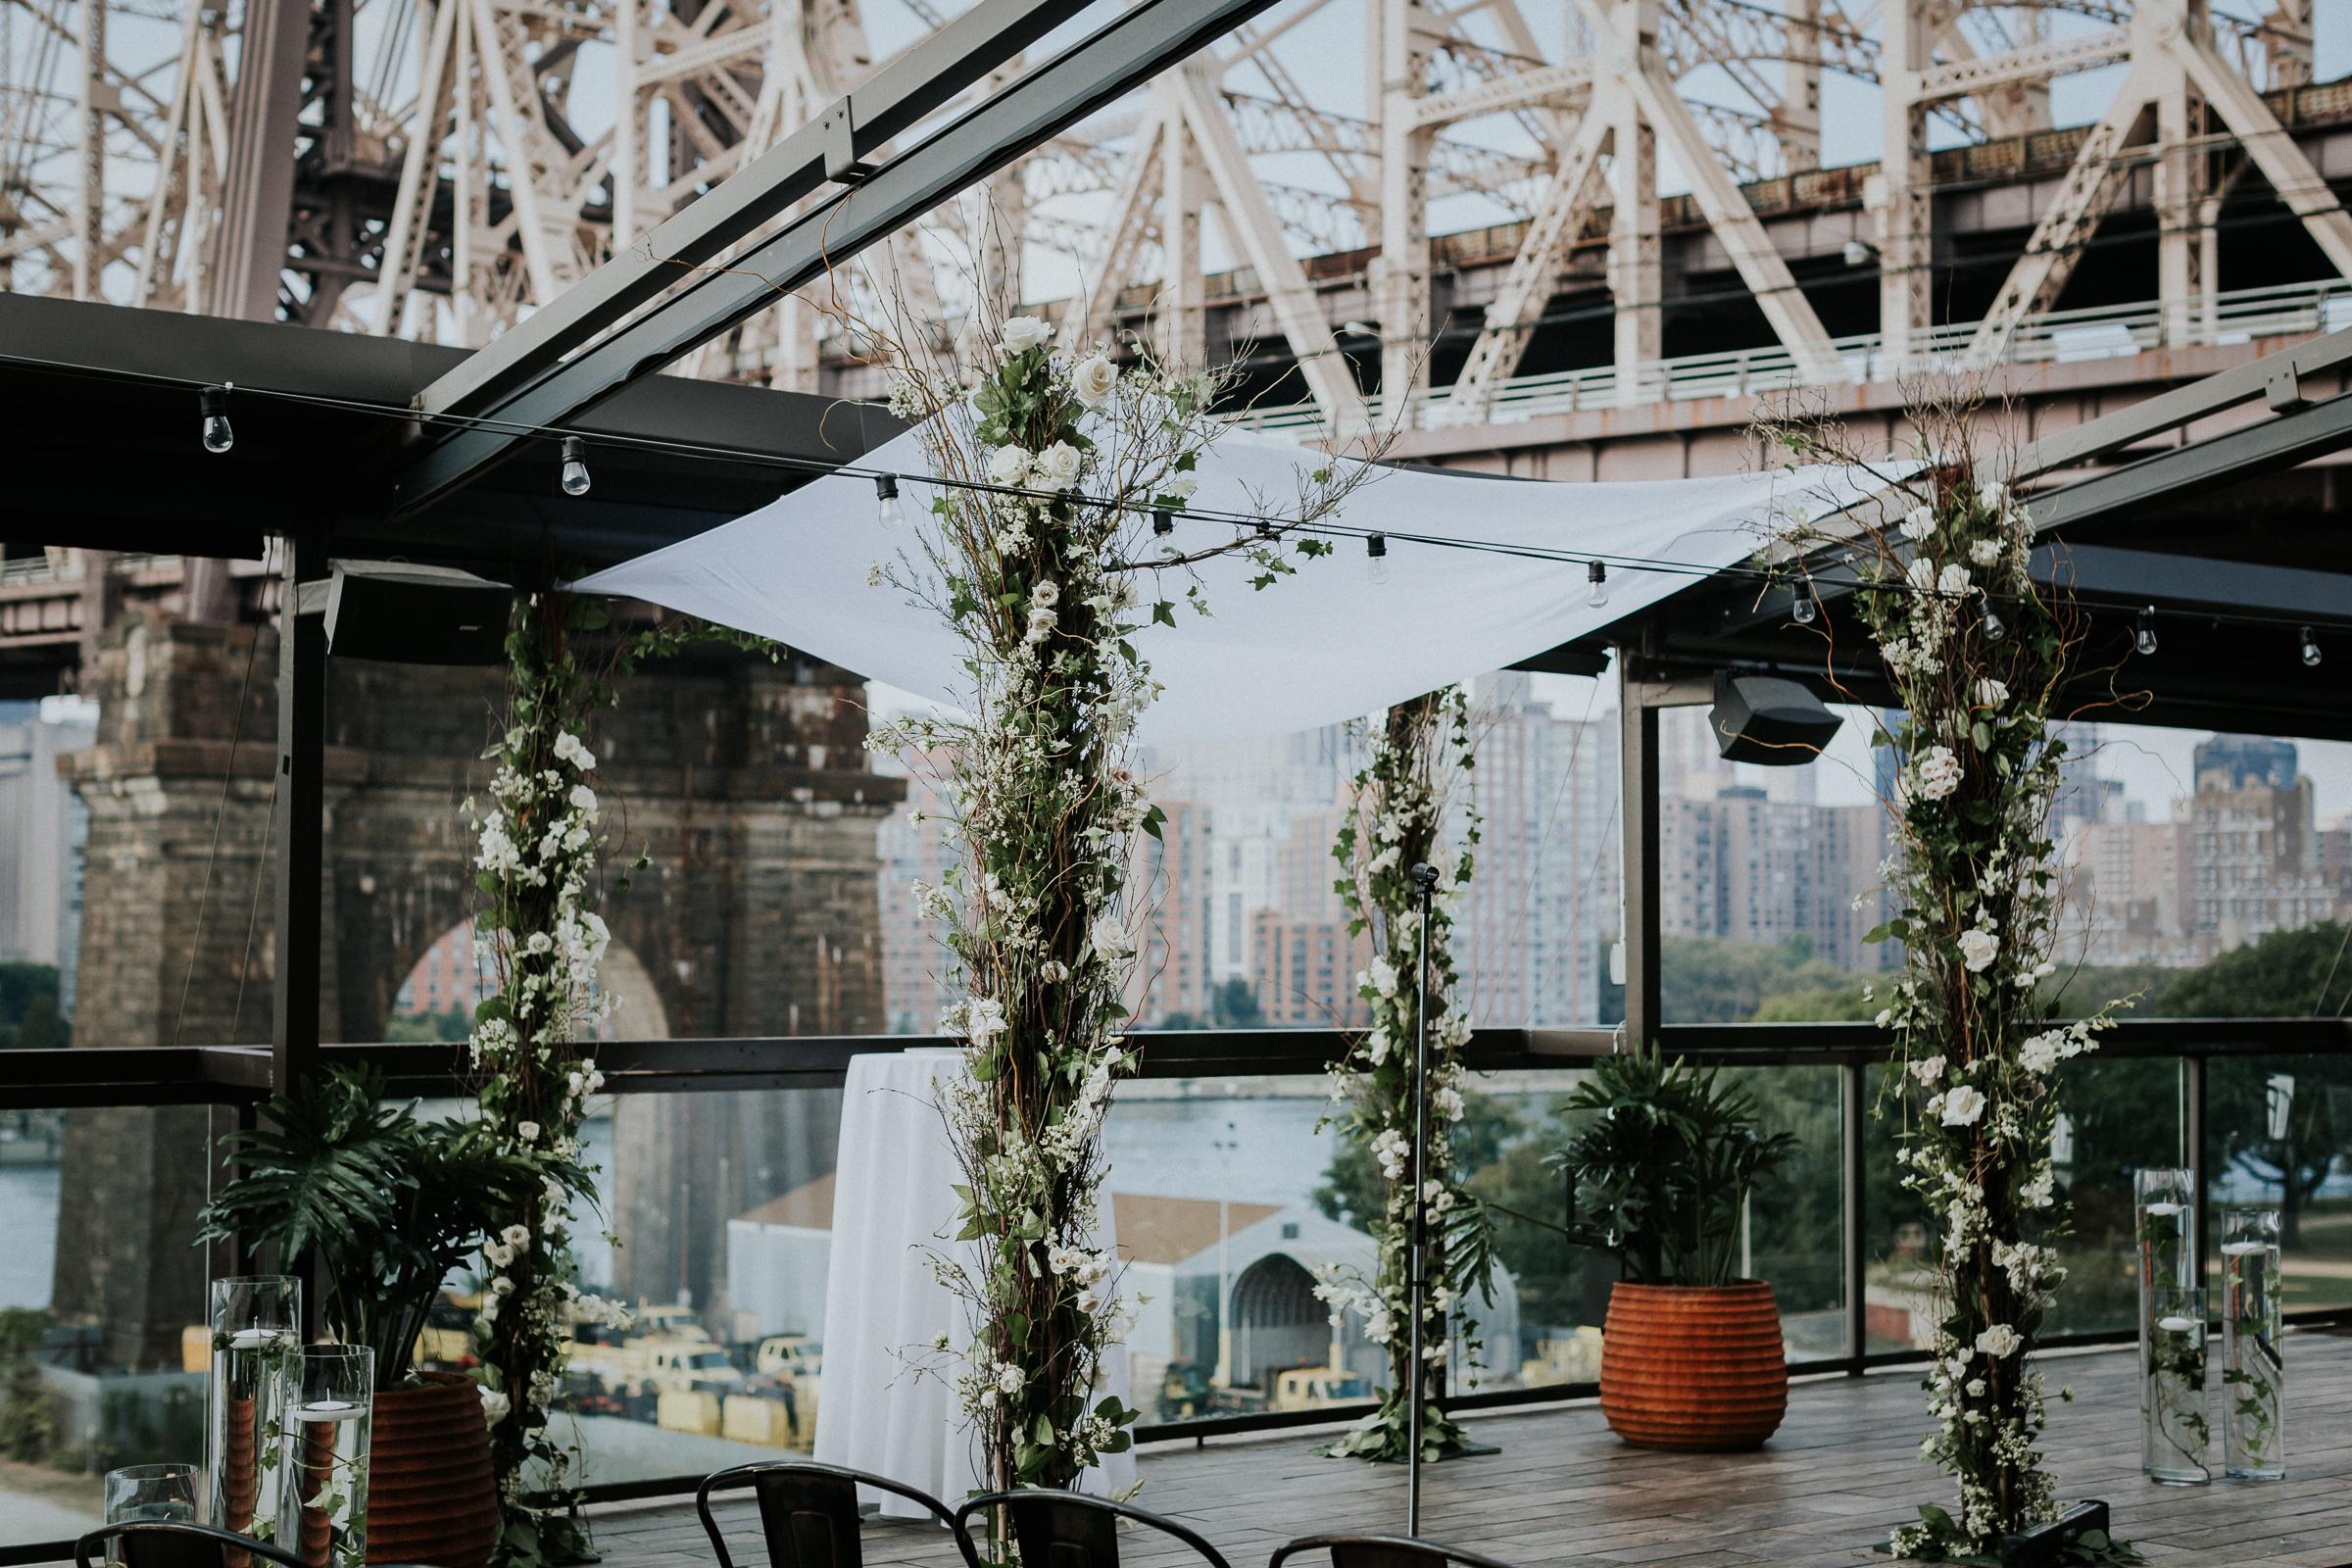 Ravel-Hotel-Penthouse-808-Long-Island-City-New-York-Documentary-Wedding-Photographer-58.jpg